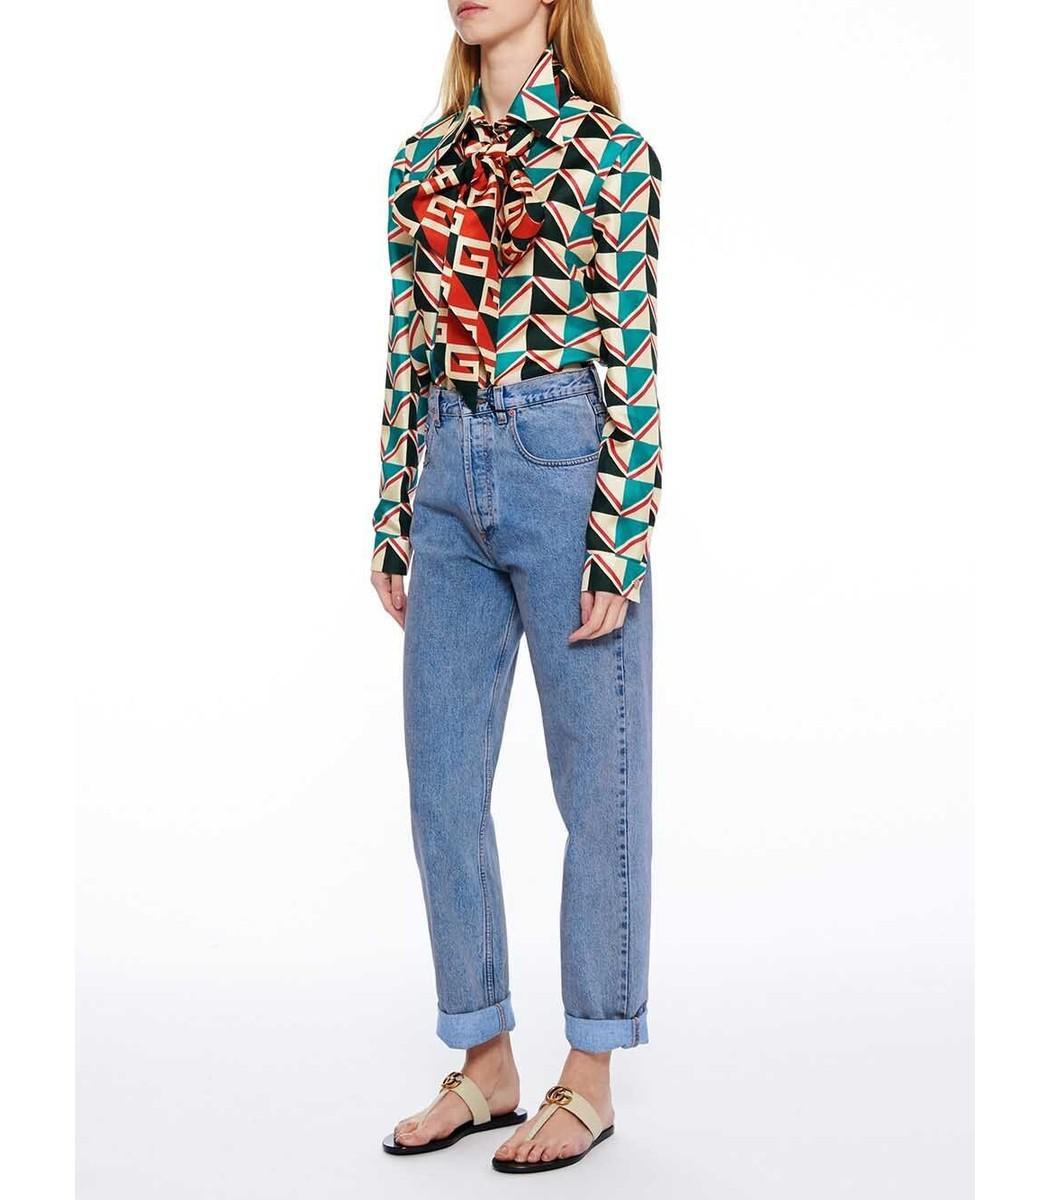 25e0fa63703 Lyst - Gucci Green Multicolor Pussy Bow Printed Silk Twill Shirt in ...